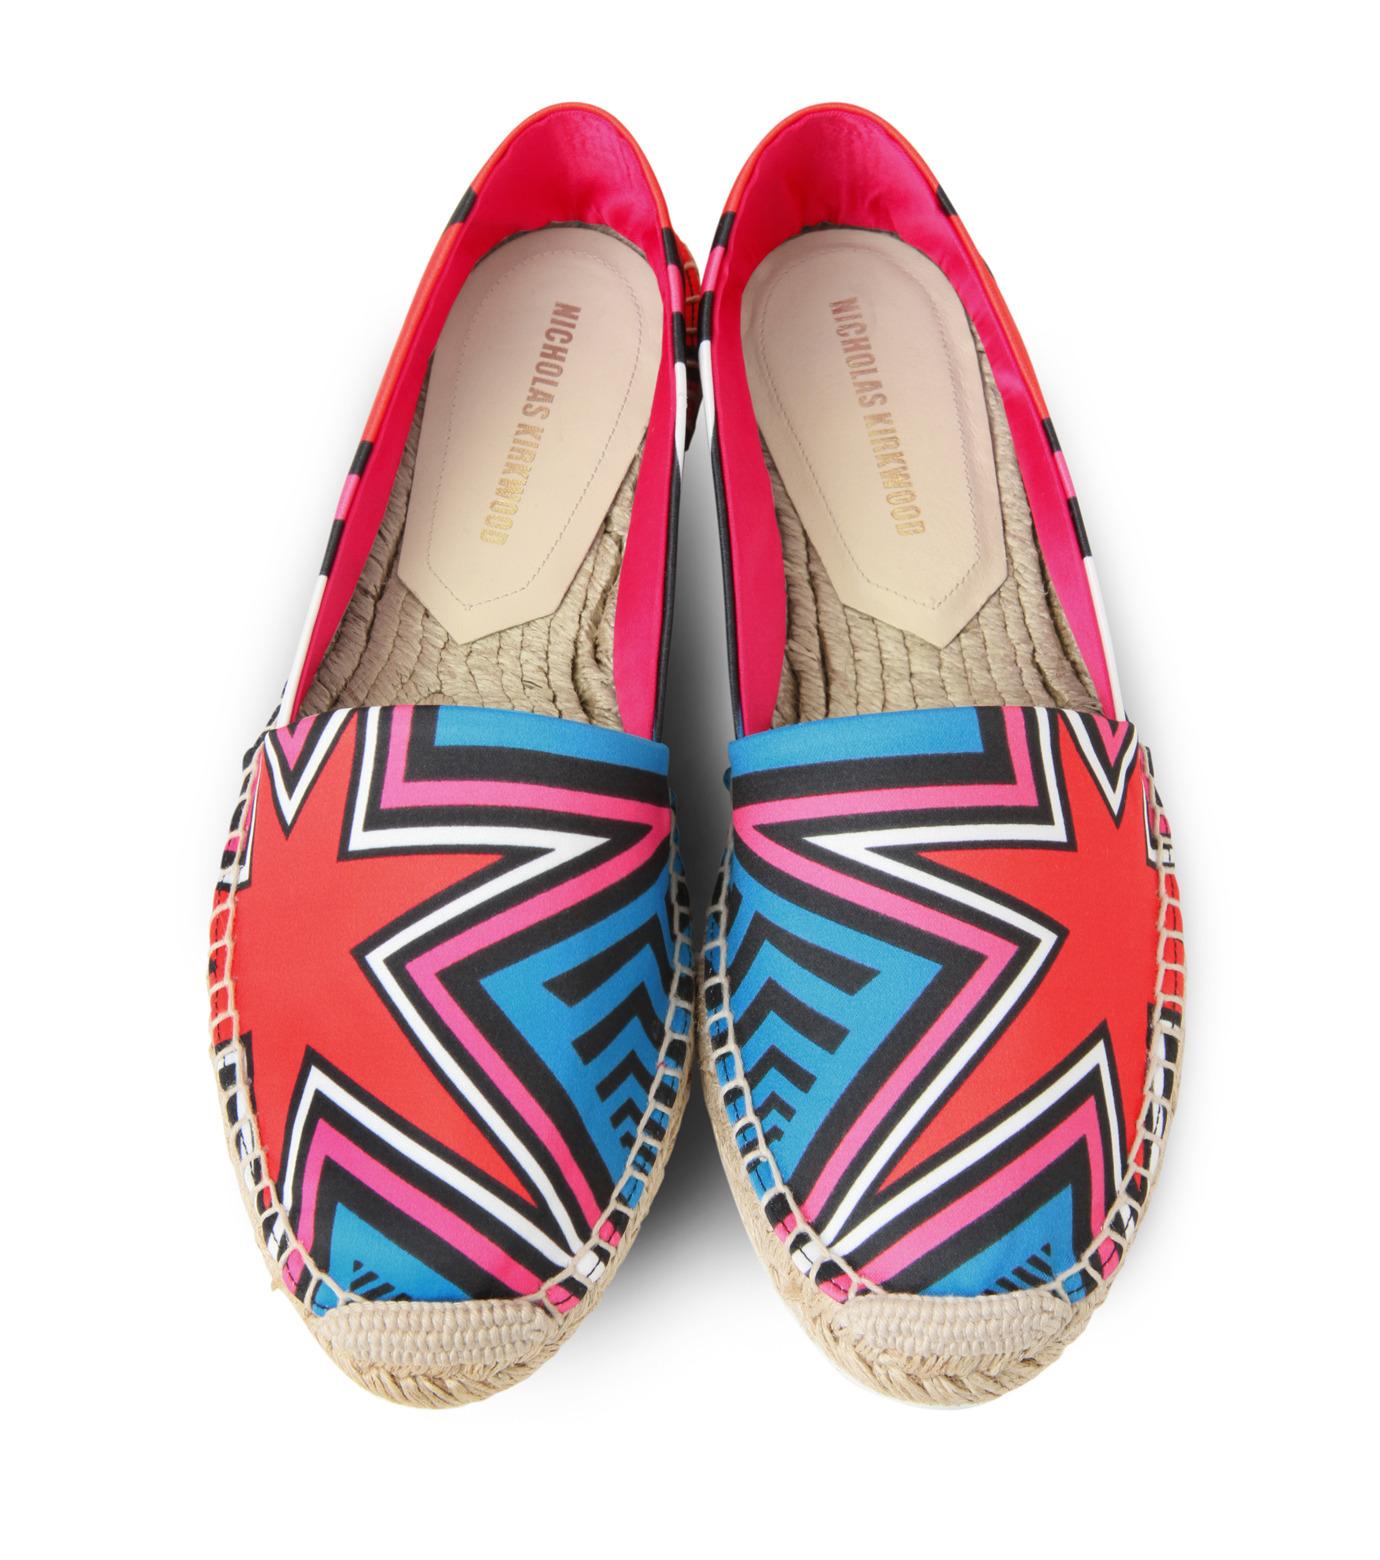 Nicholas  Kirkwood(ニコラス カークウッド)のEspadrille Loafer-MULTI COLOUR(シューズ/shoes)-15SF012-9 拡大詳細画像4